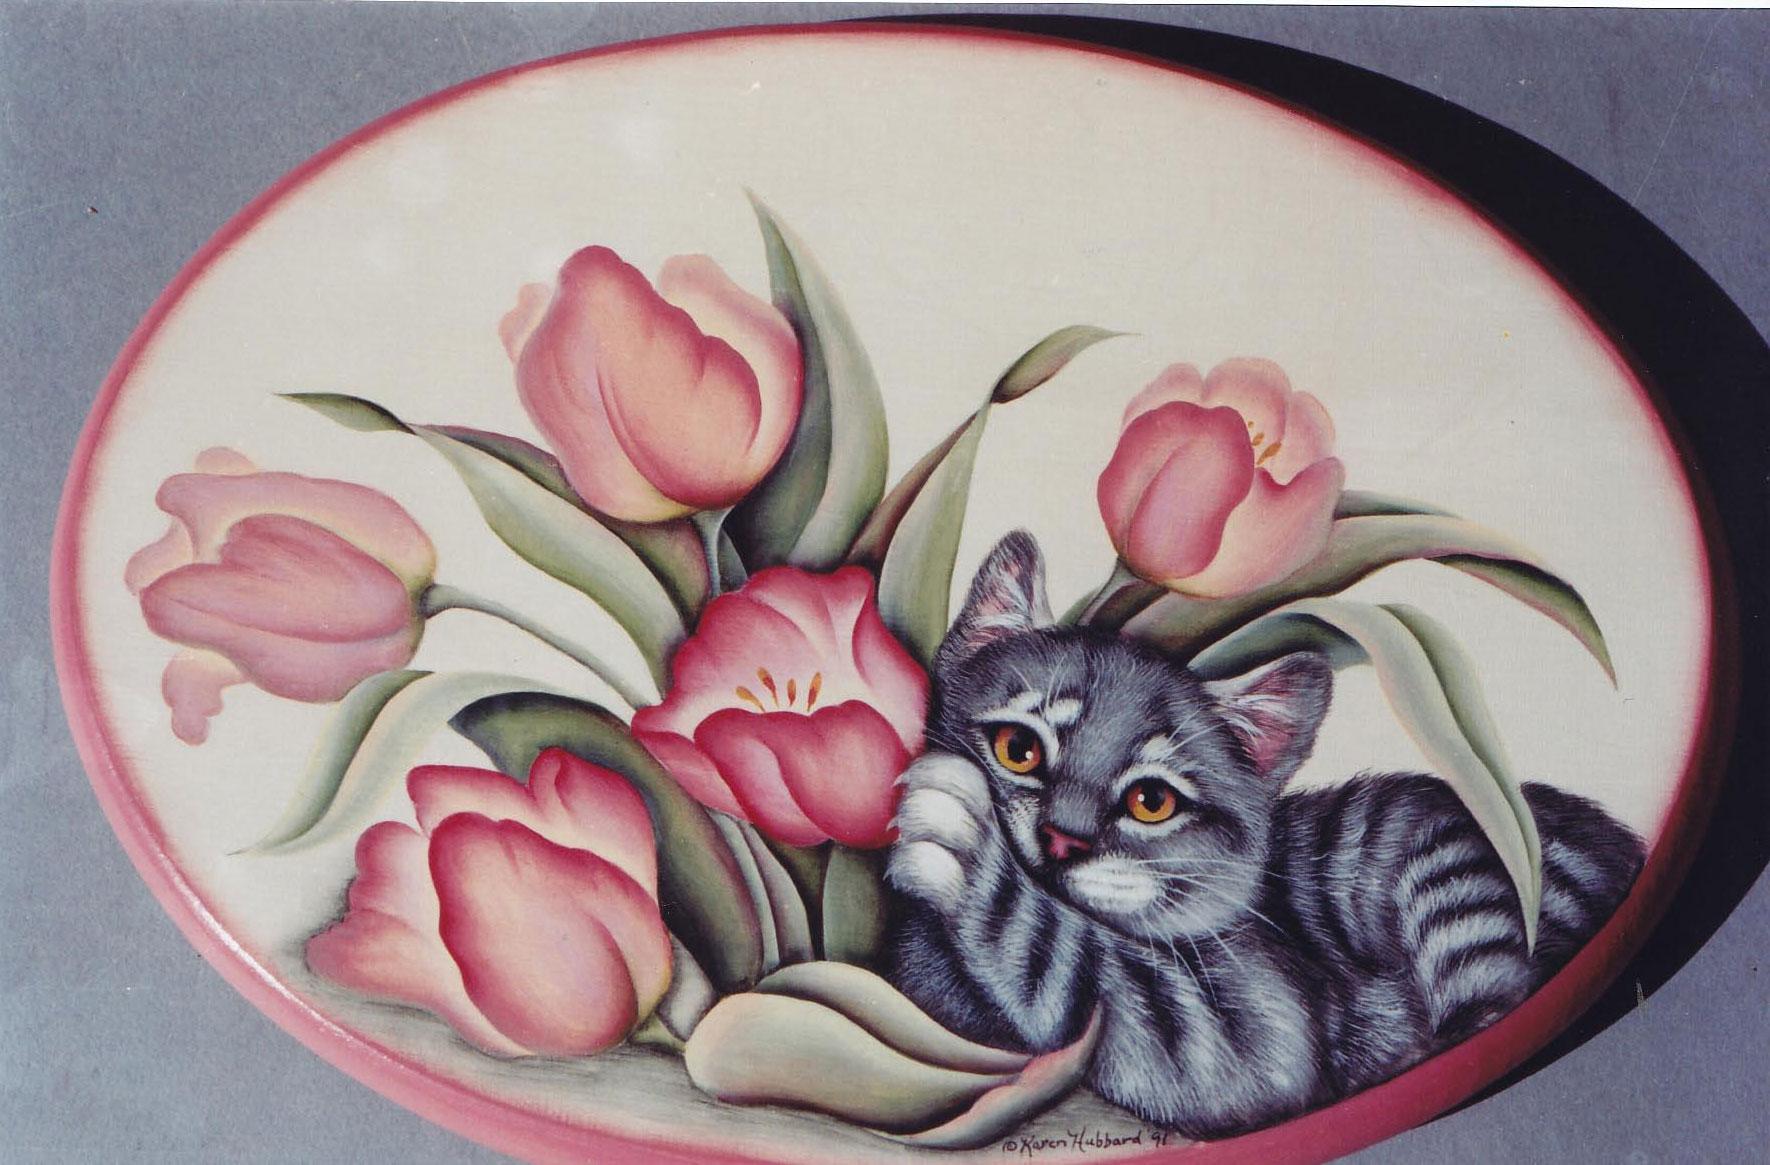 Spring kitten - Karen Hubbard